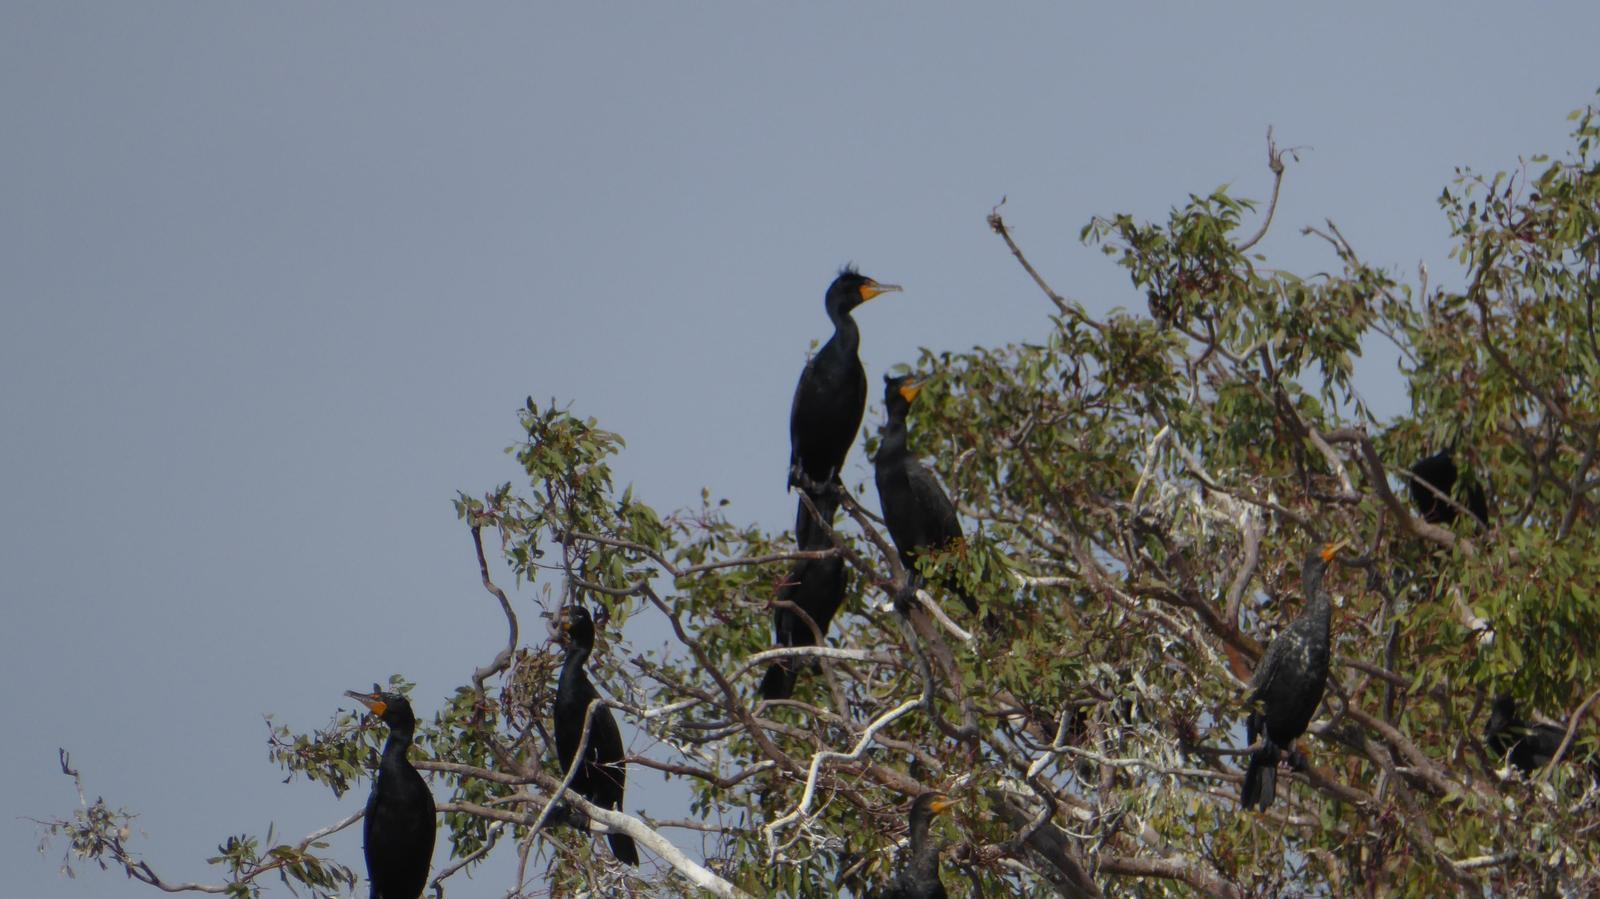 Double-crested Cormorant Photo by Daliel Leite